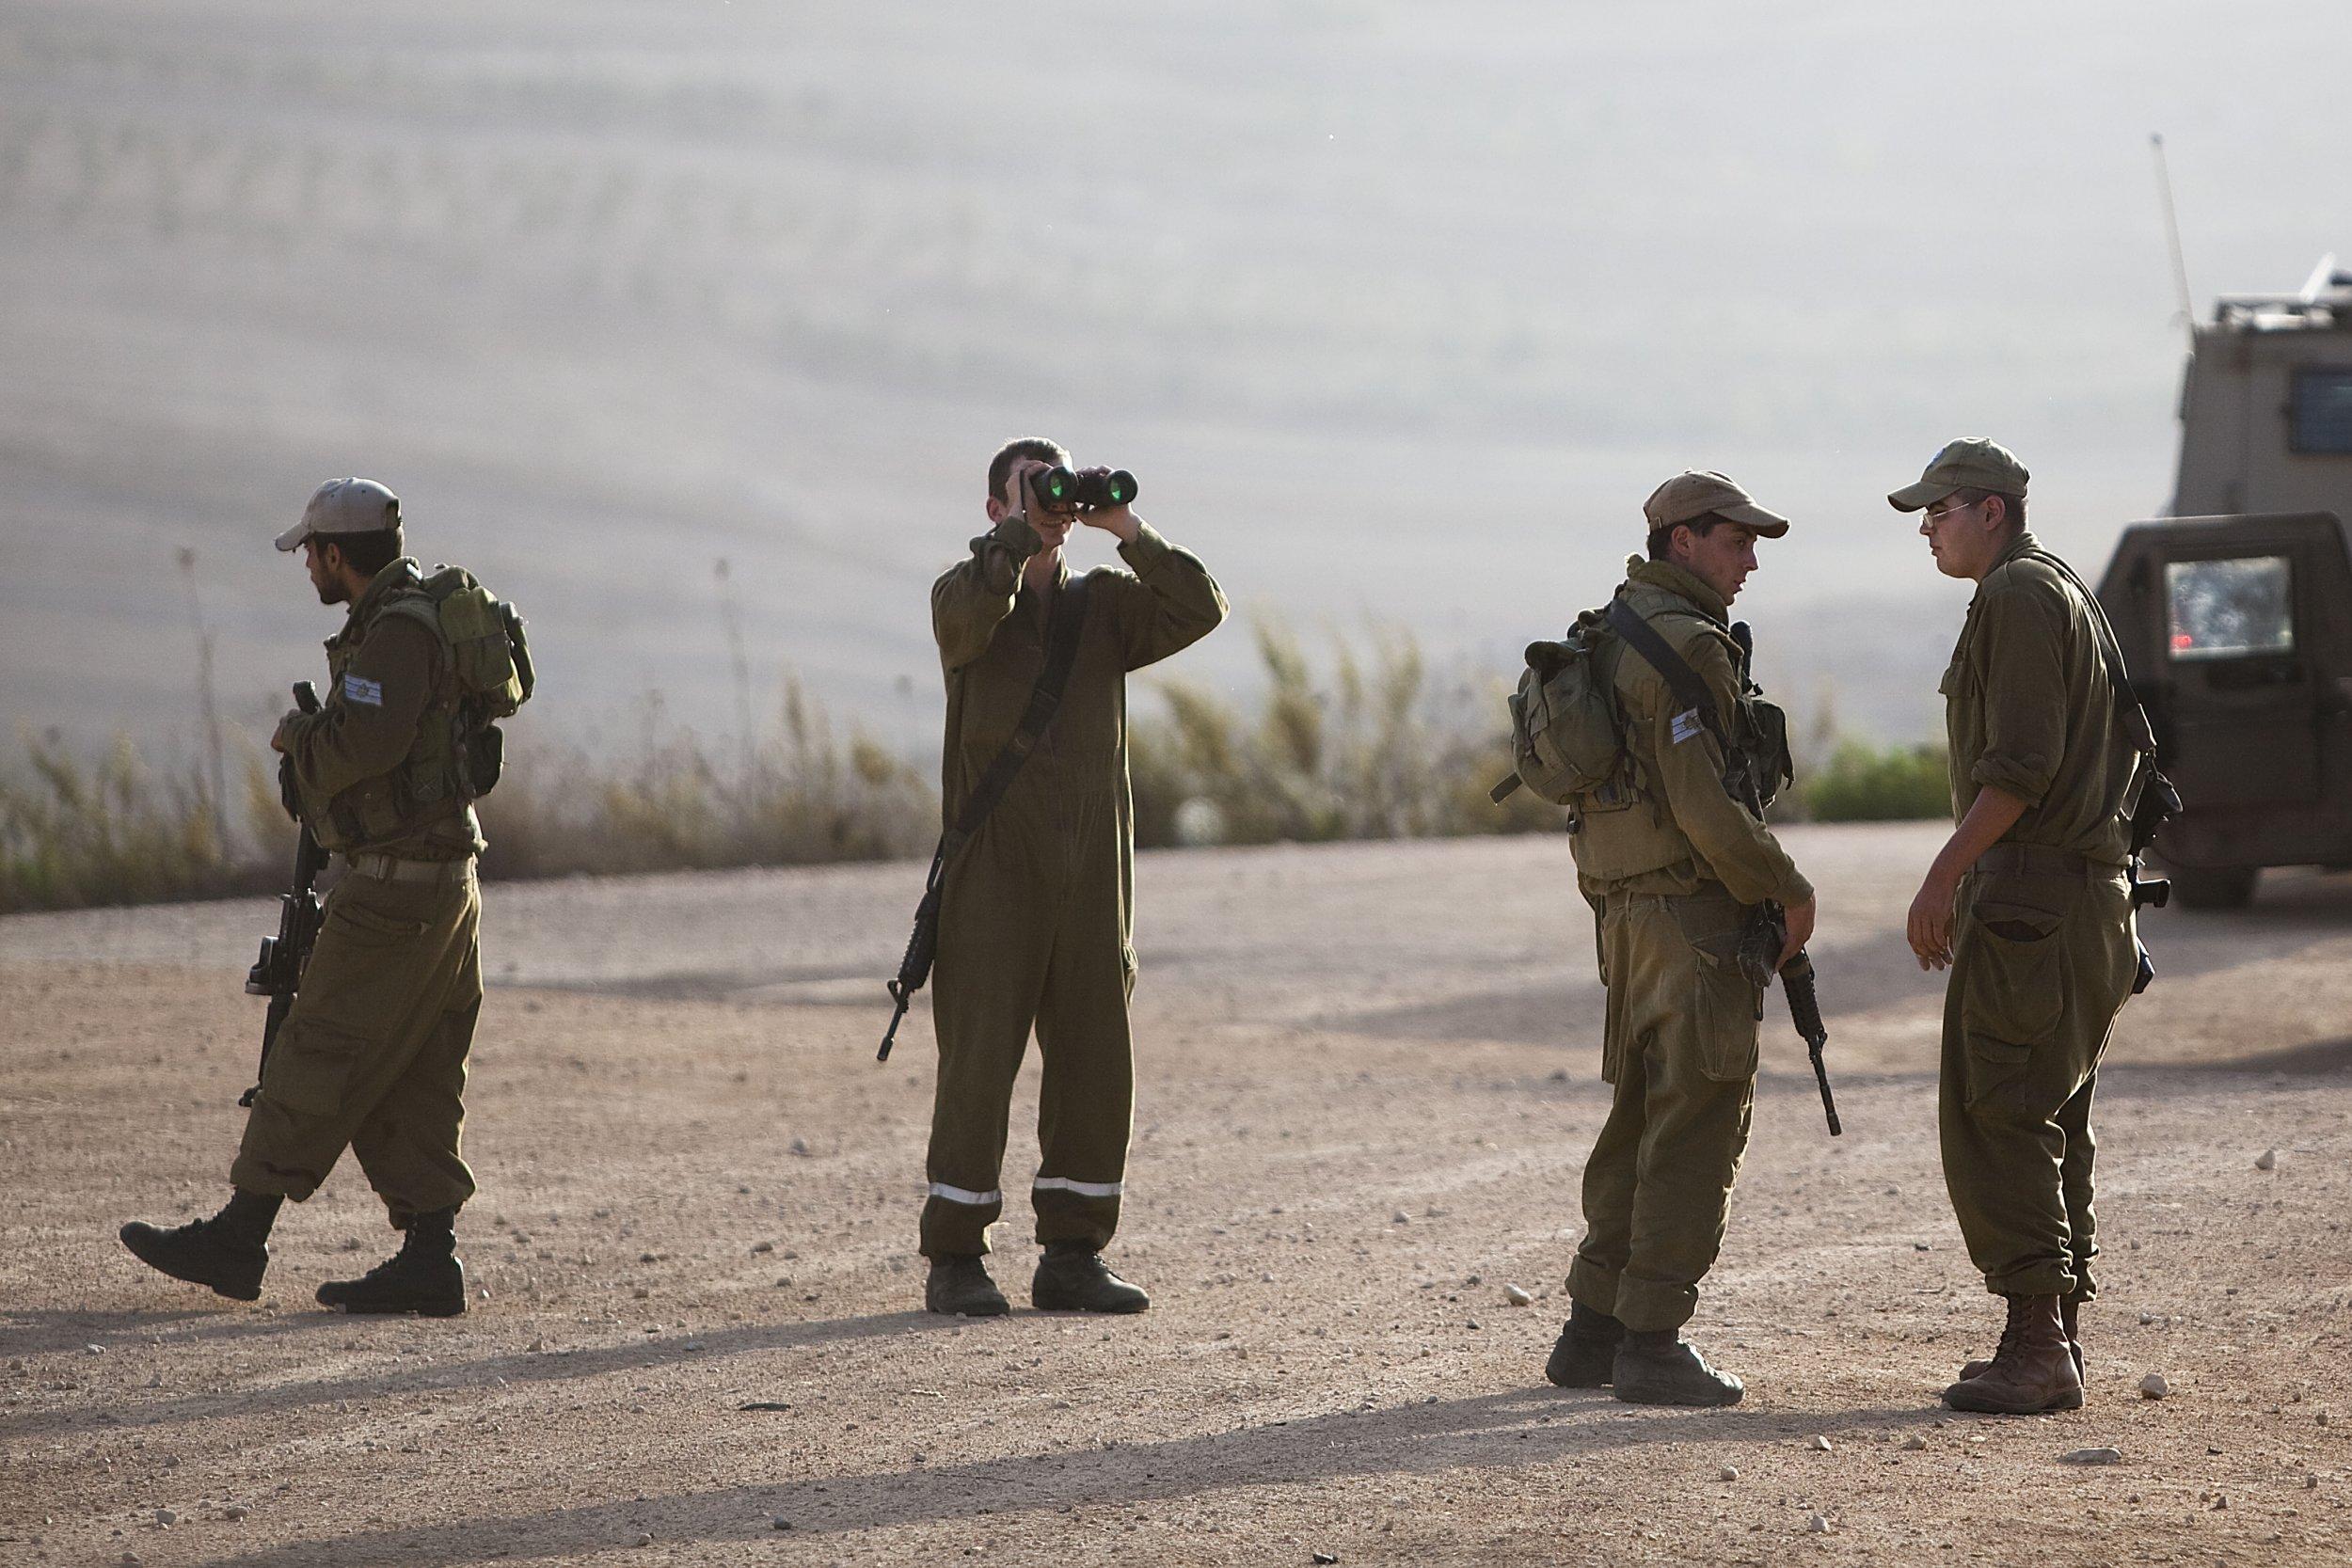 02_24_Abrams_Hezbollah_01